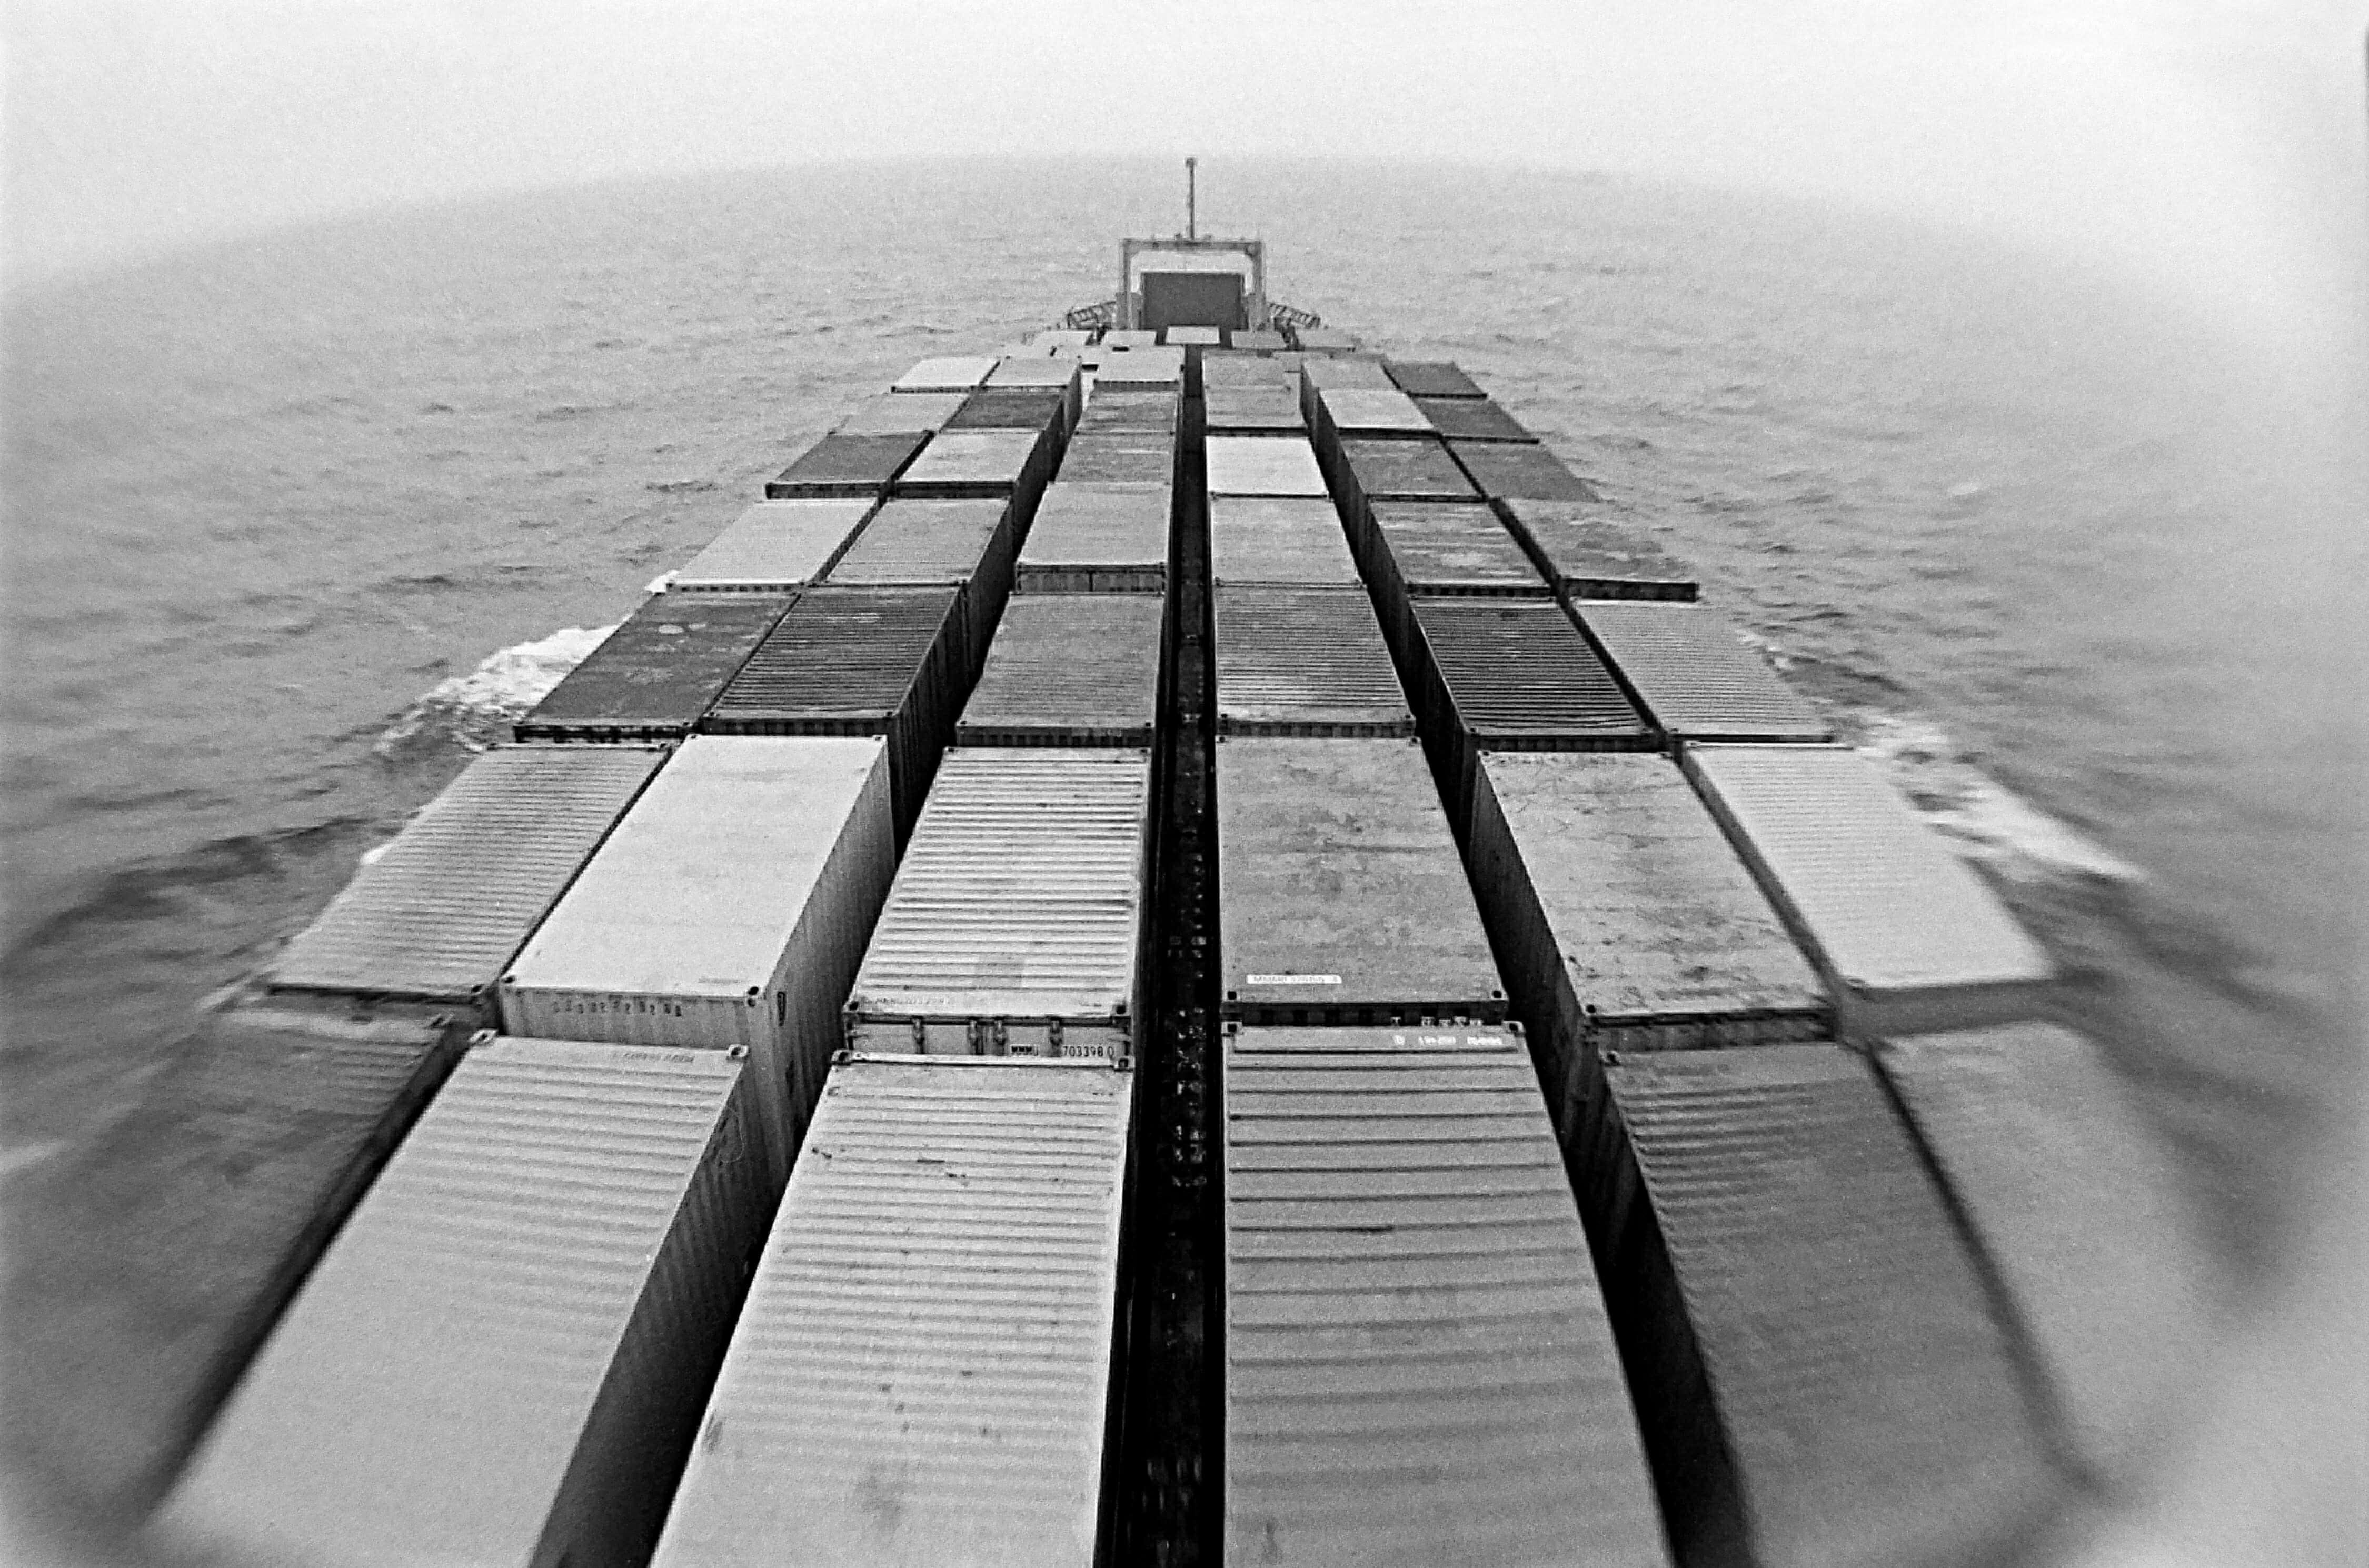 370 судов оказались заблокированы в районе Суэцкого канала